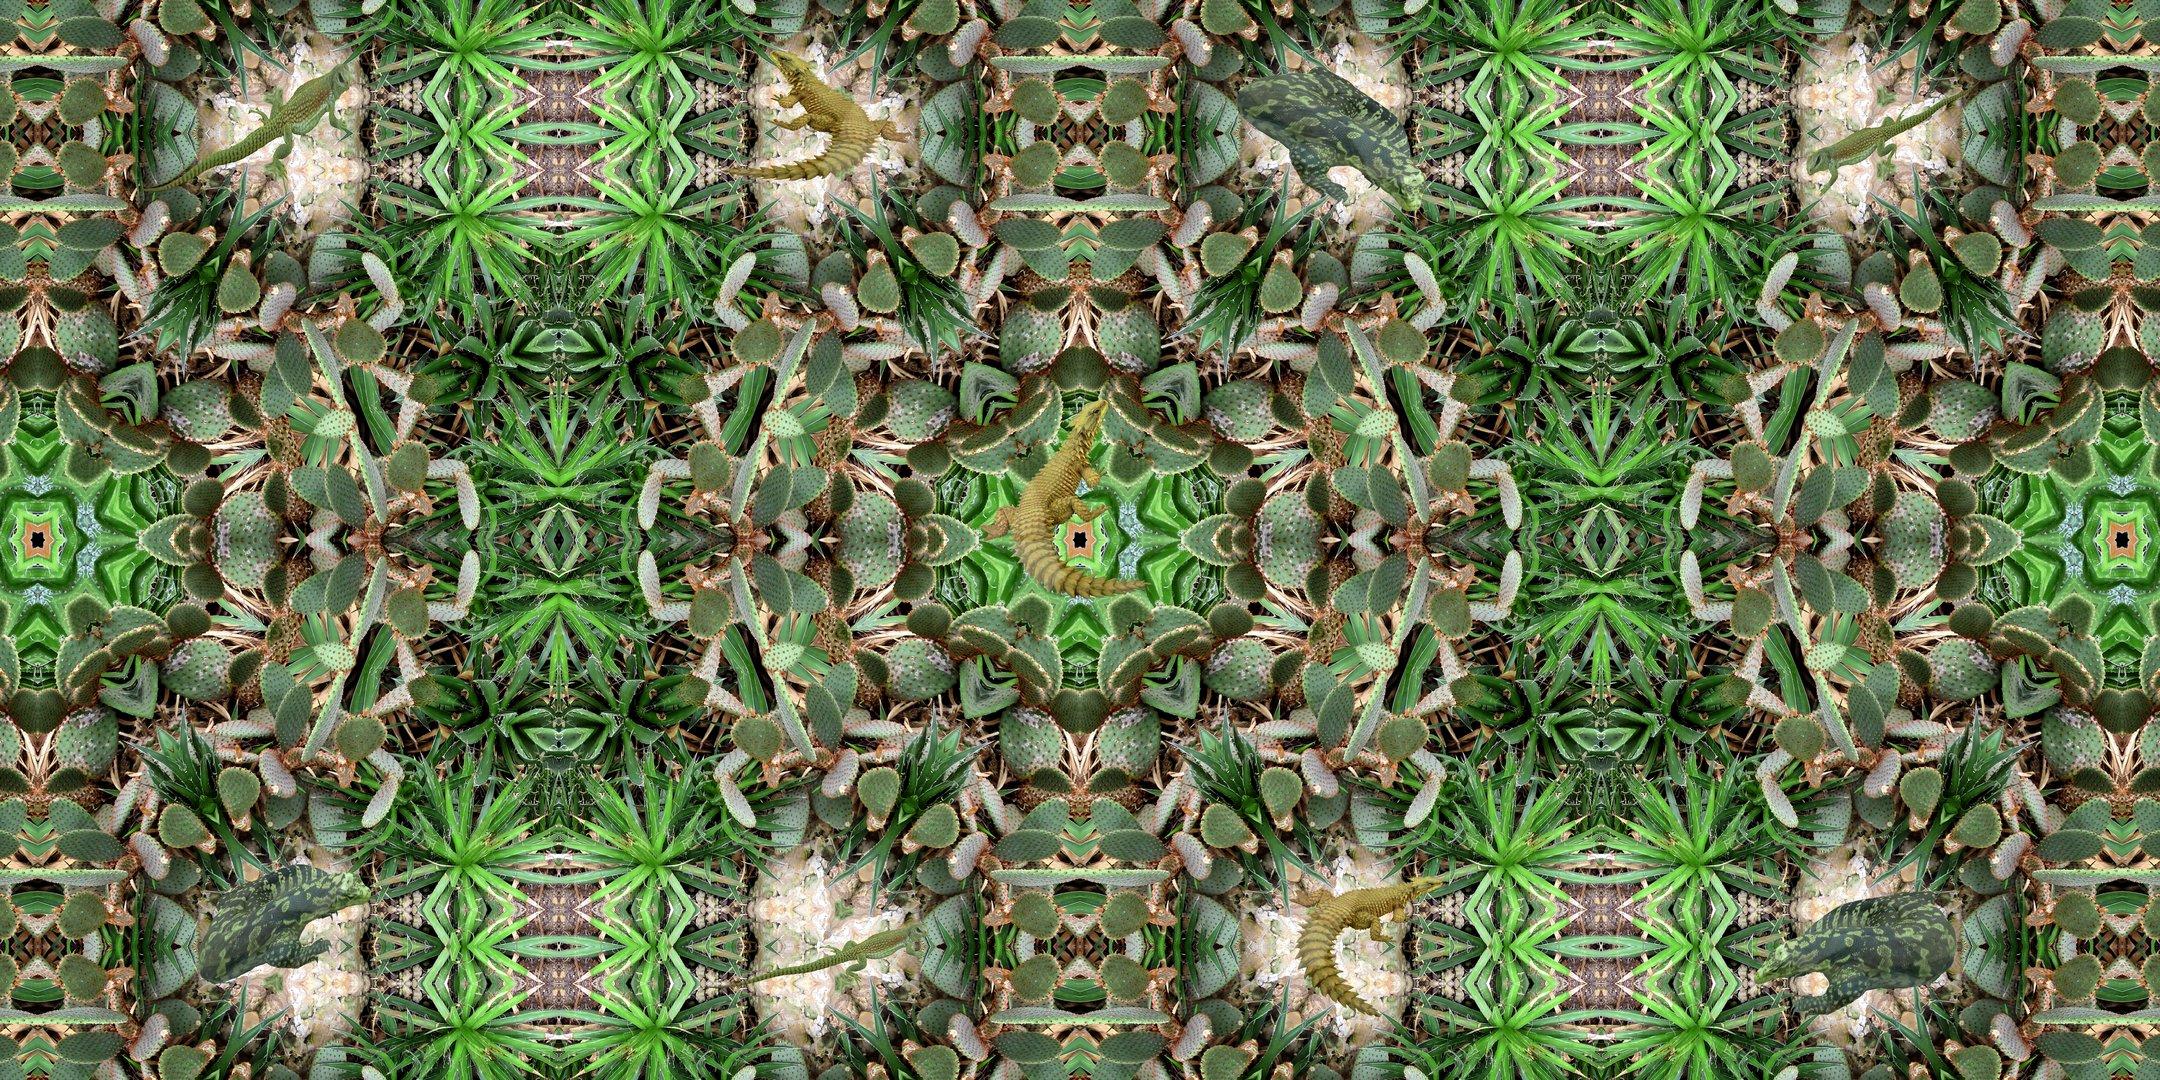 Lizards in a landscape of cactus_1